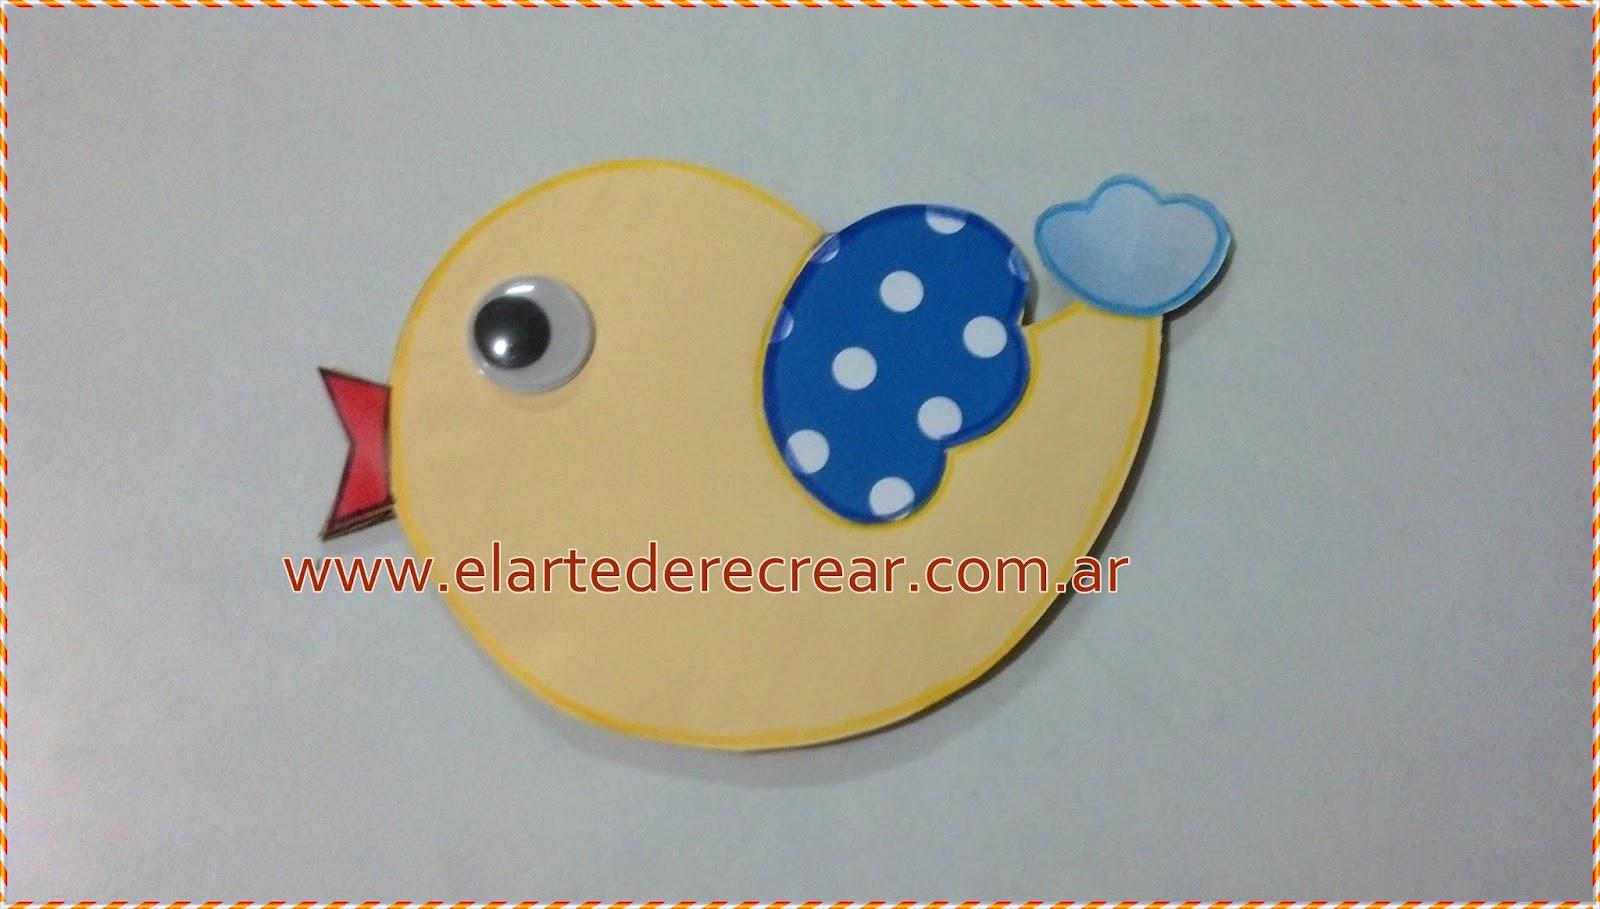 P jaros de cartulina de colores recrear manualidades - Ver como hacer manualidades ...